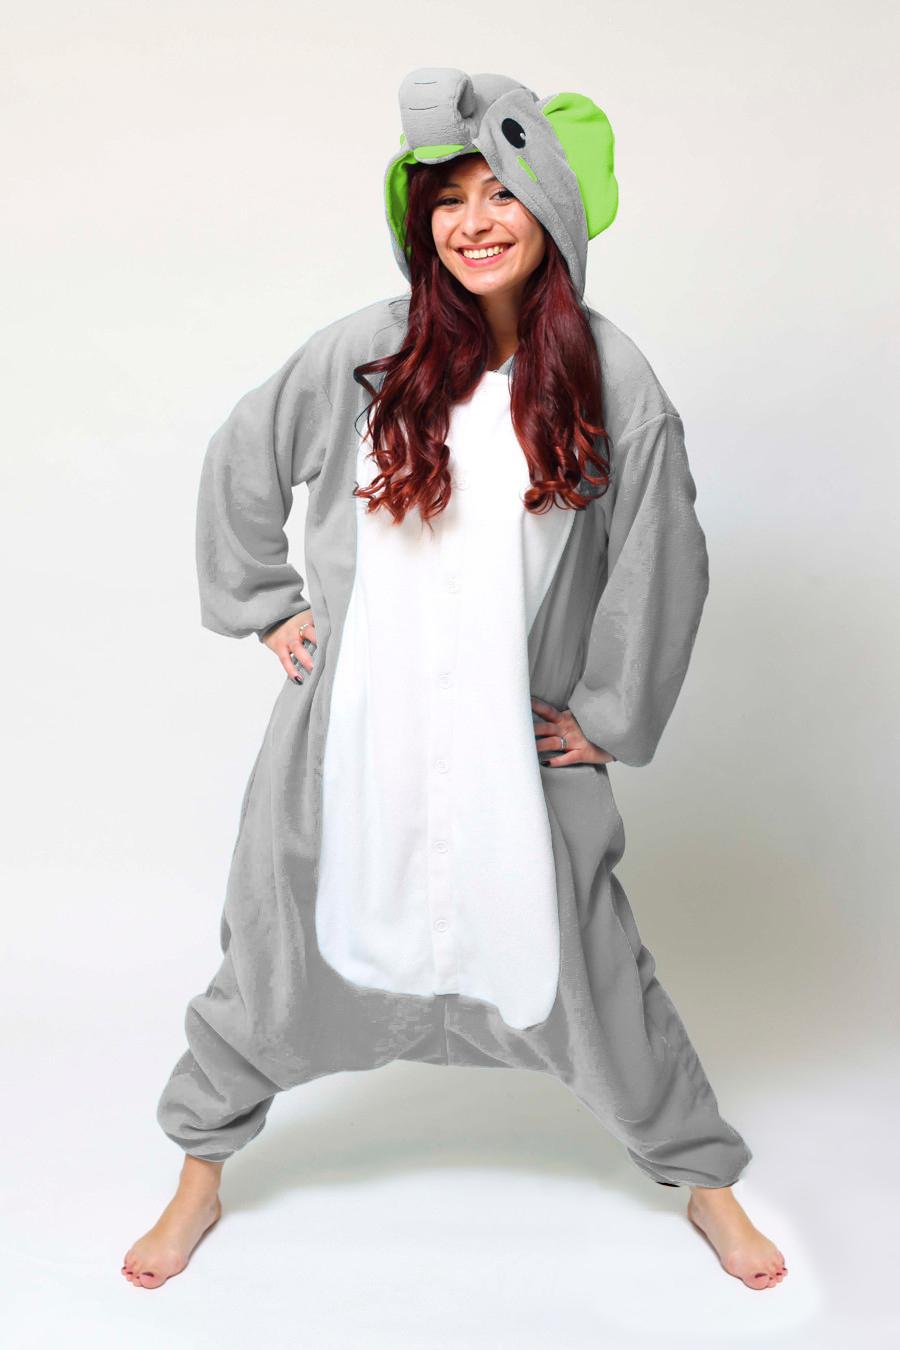 d450187a7791 Buy your Grey Elephant onesie now! - PartyinyourAnimal.com